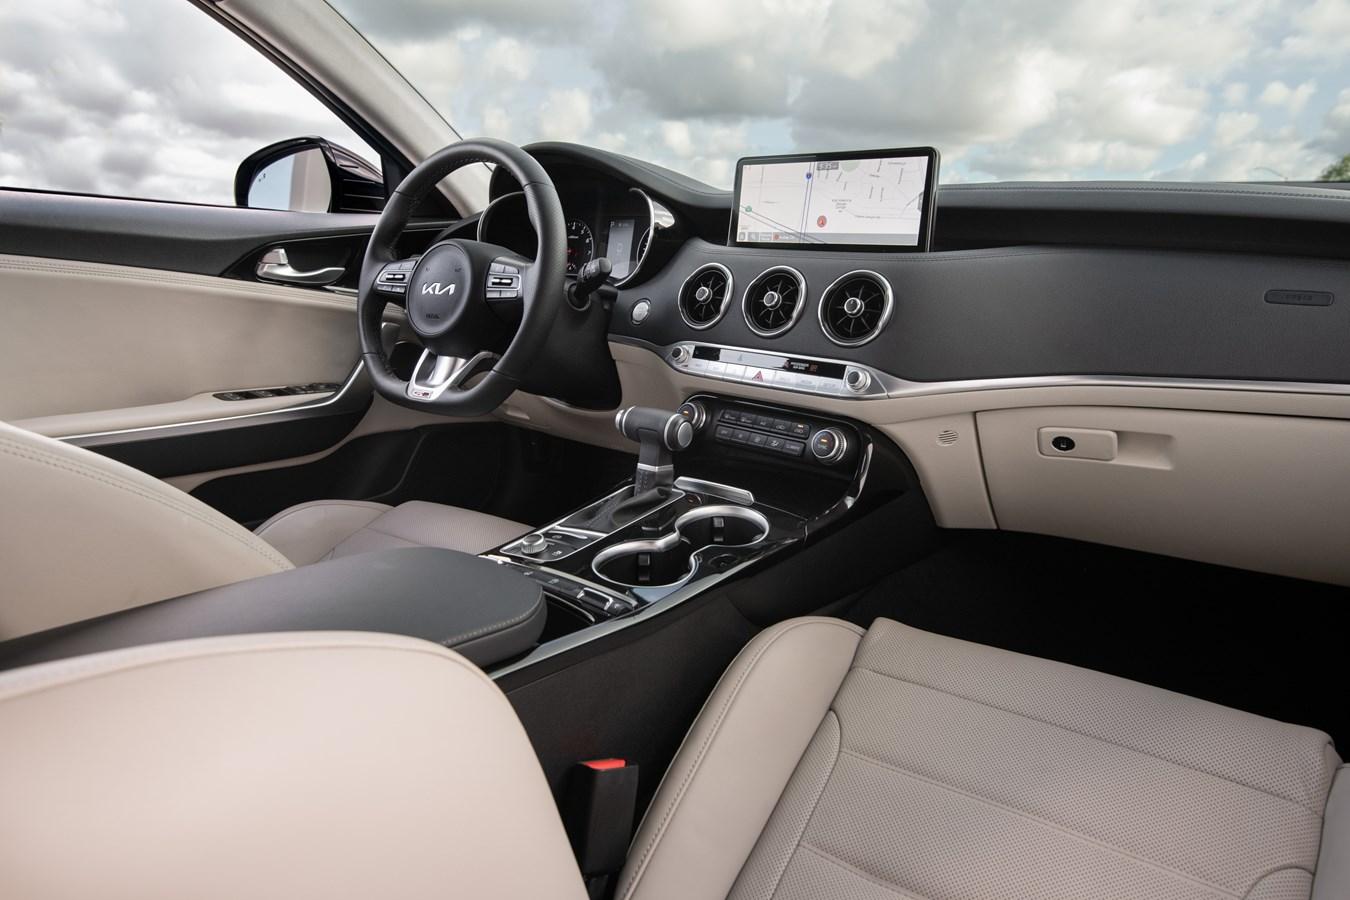 2022 Stinger GT-Line interior front angle